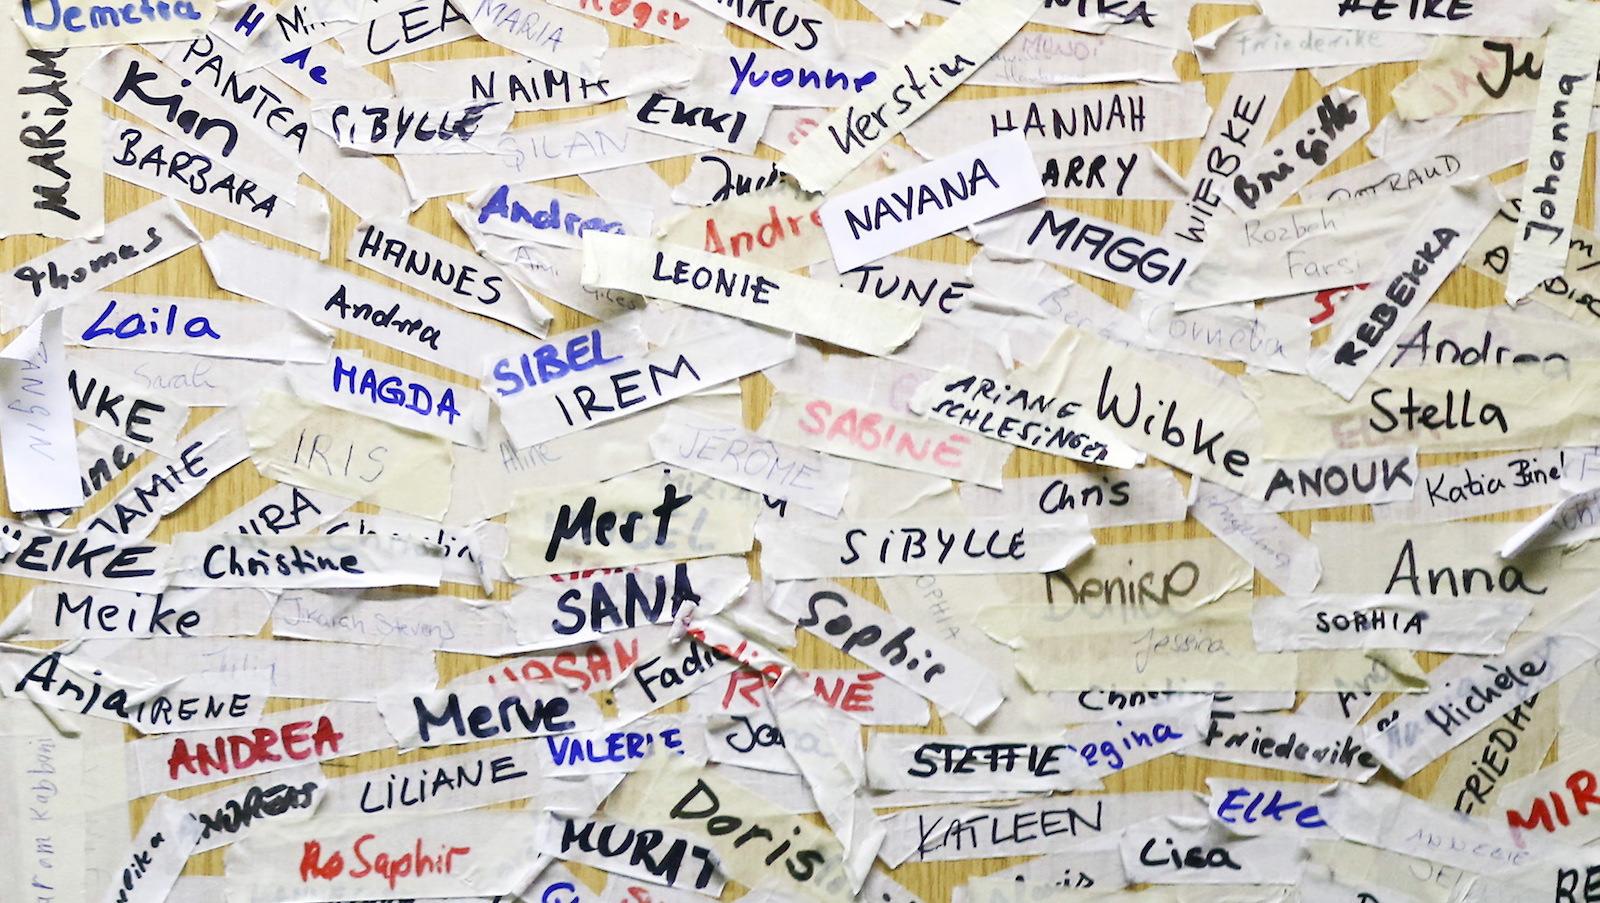 Nyc Chelsea Bomber Name Prejudice Against Ethnic Sounding Names